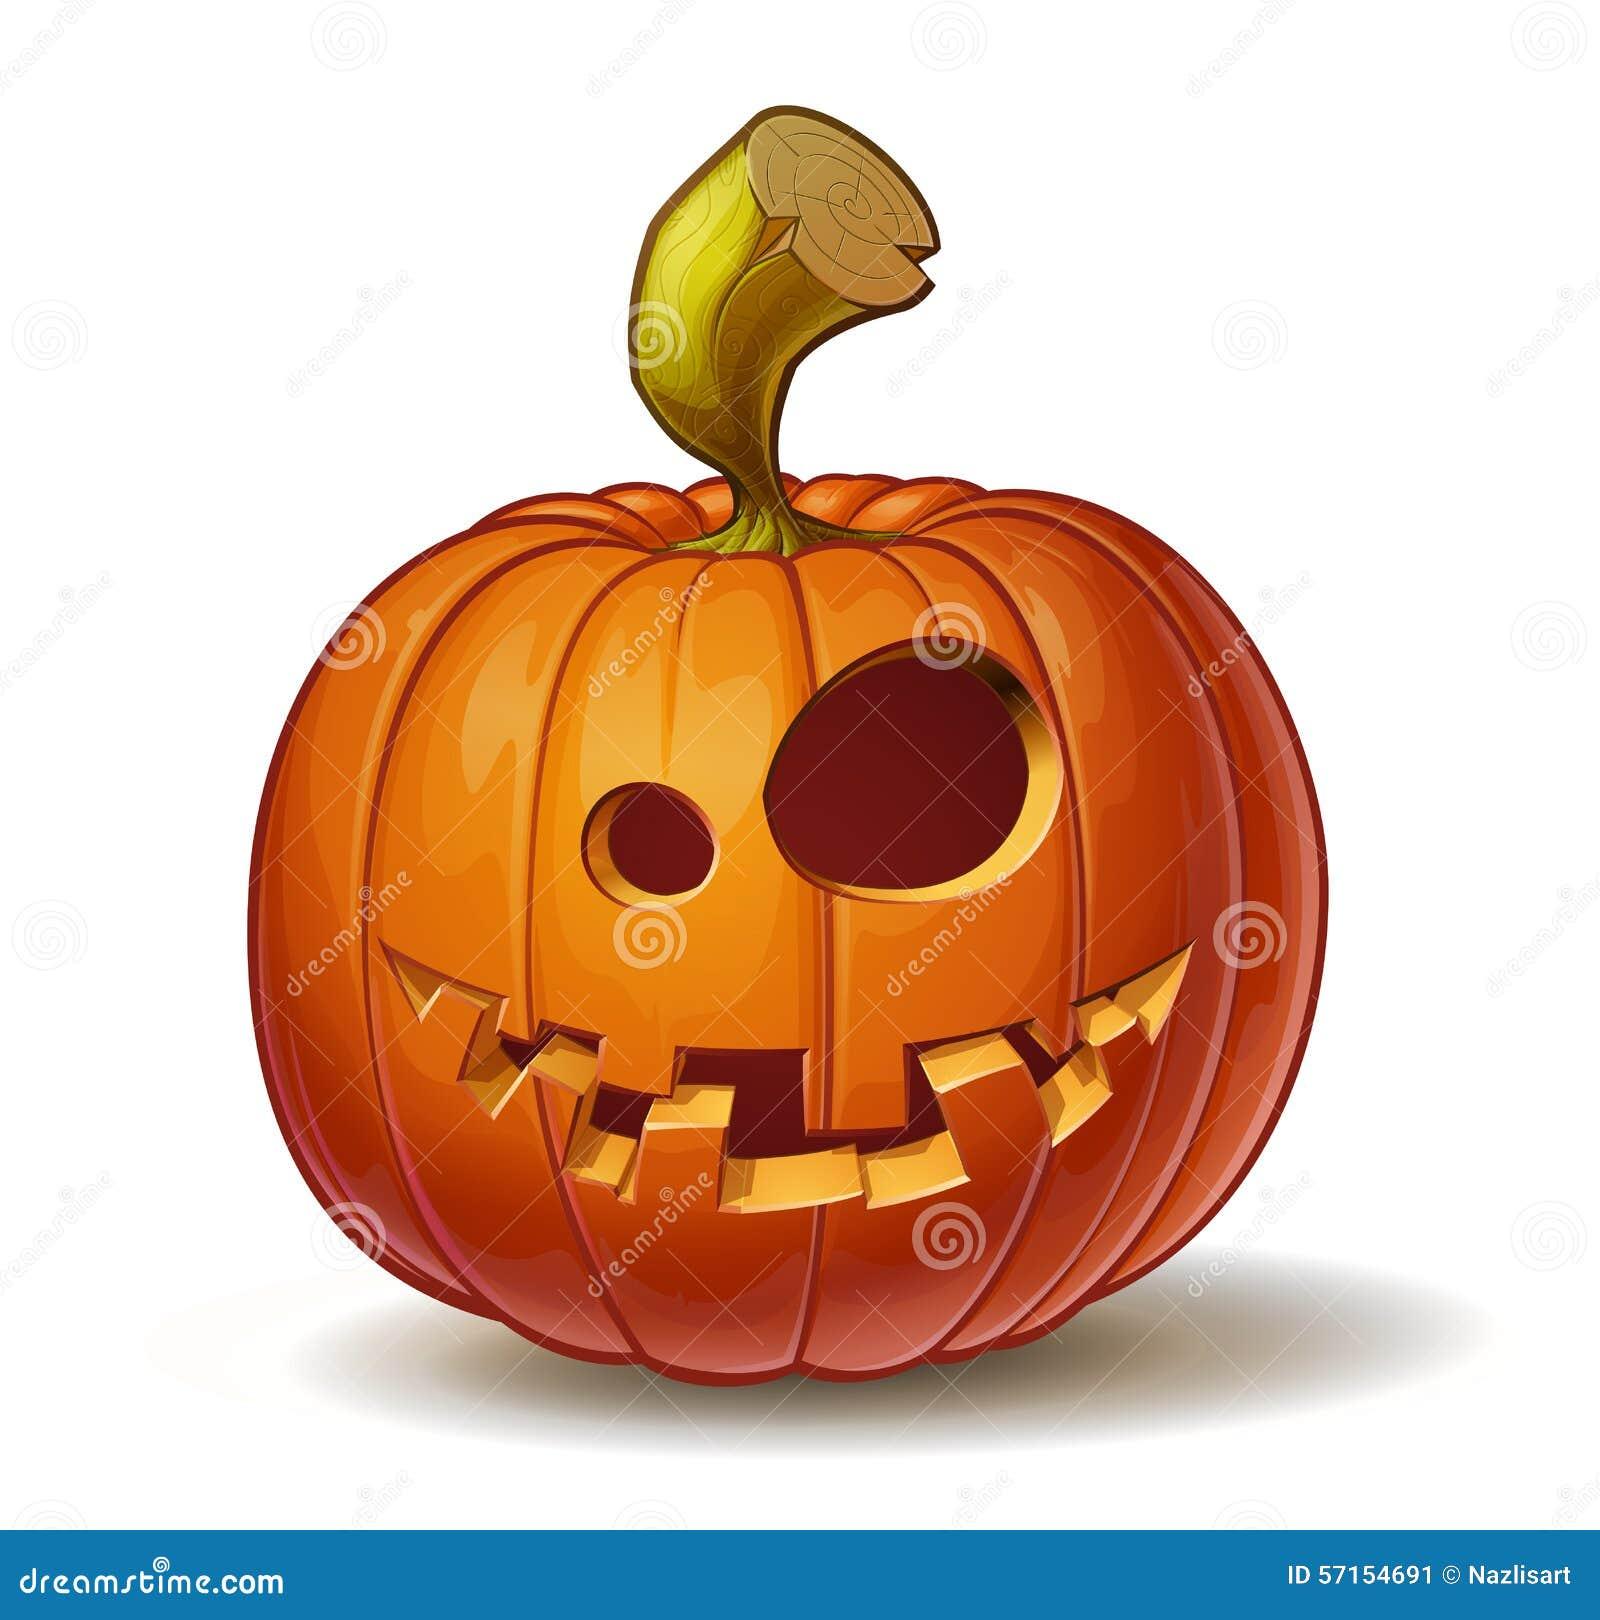 Pumpkins funny 1 stock vector image 57154691 for Funny pumpkin drawings